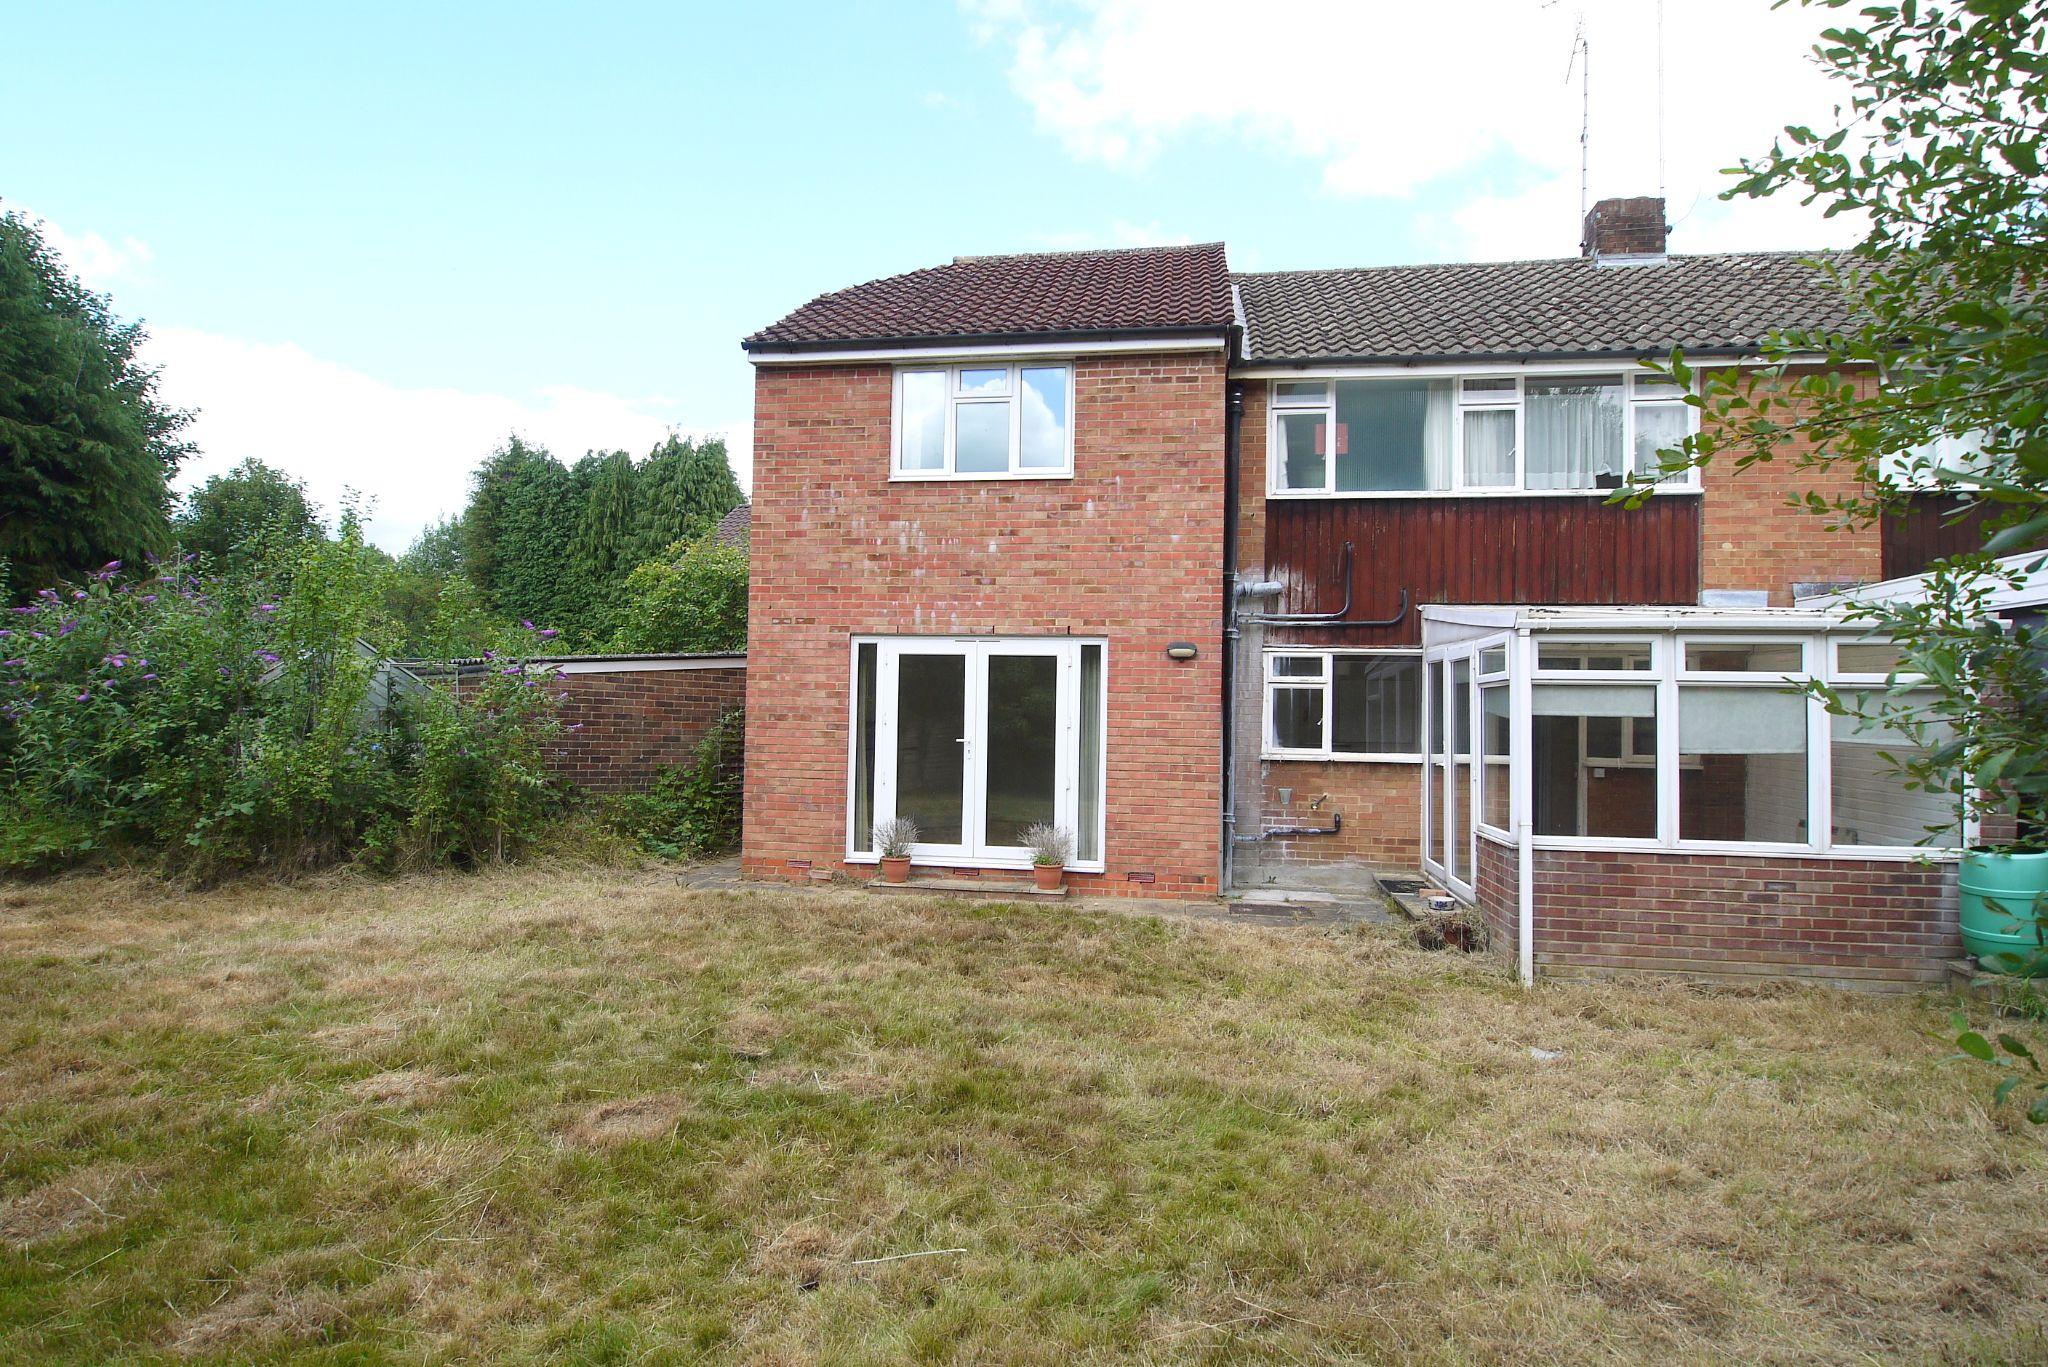 5 bedroom semi-detached house Sold in Sevenoaks - Photograph 12